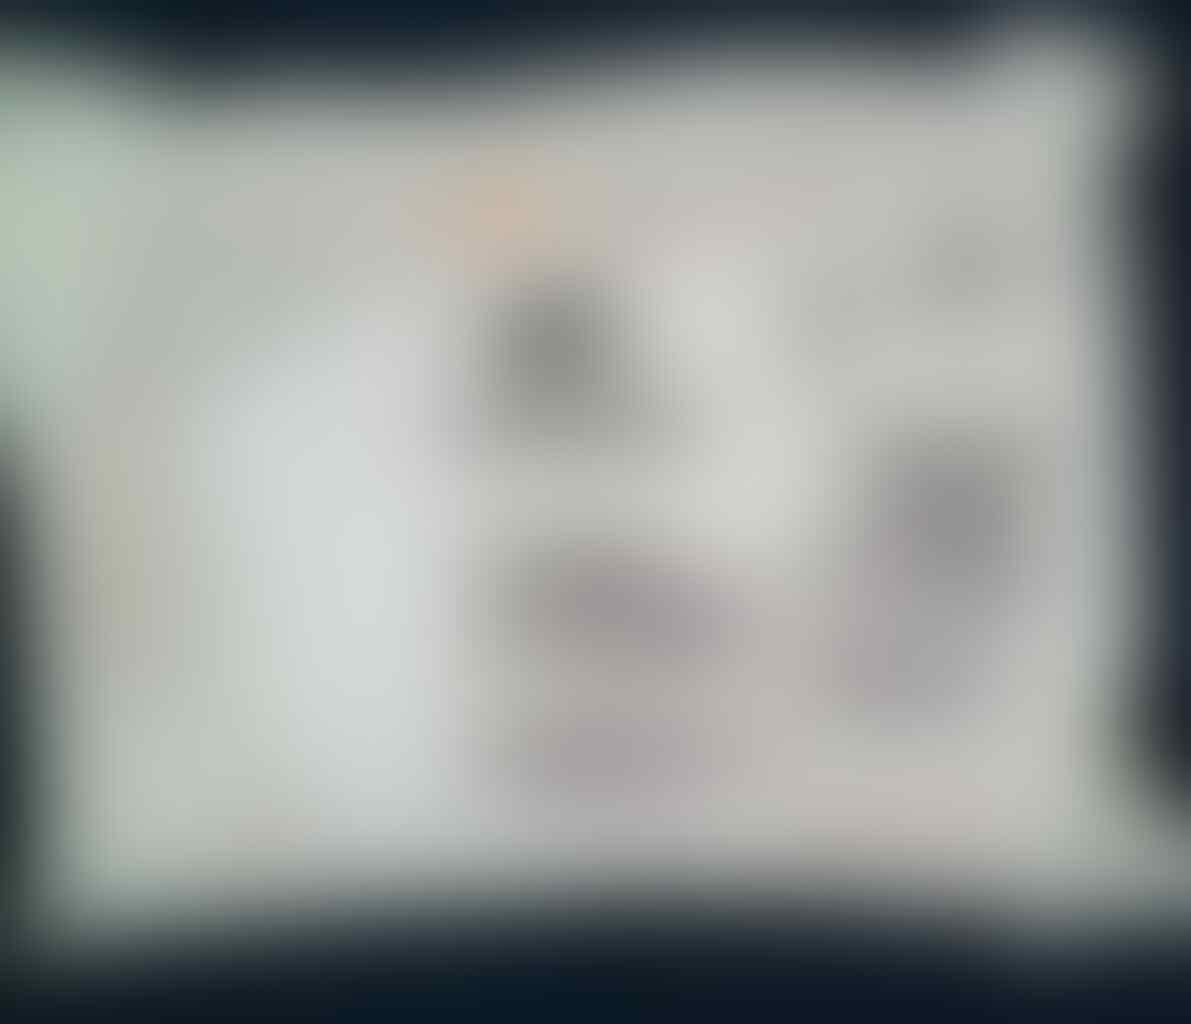 Jasa Order Ebay, Bid Ebay, Bayar Ebay Amazon DHGate Aliexpress Playasia Fee 10.000